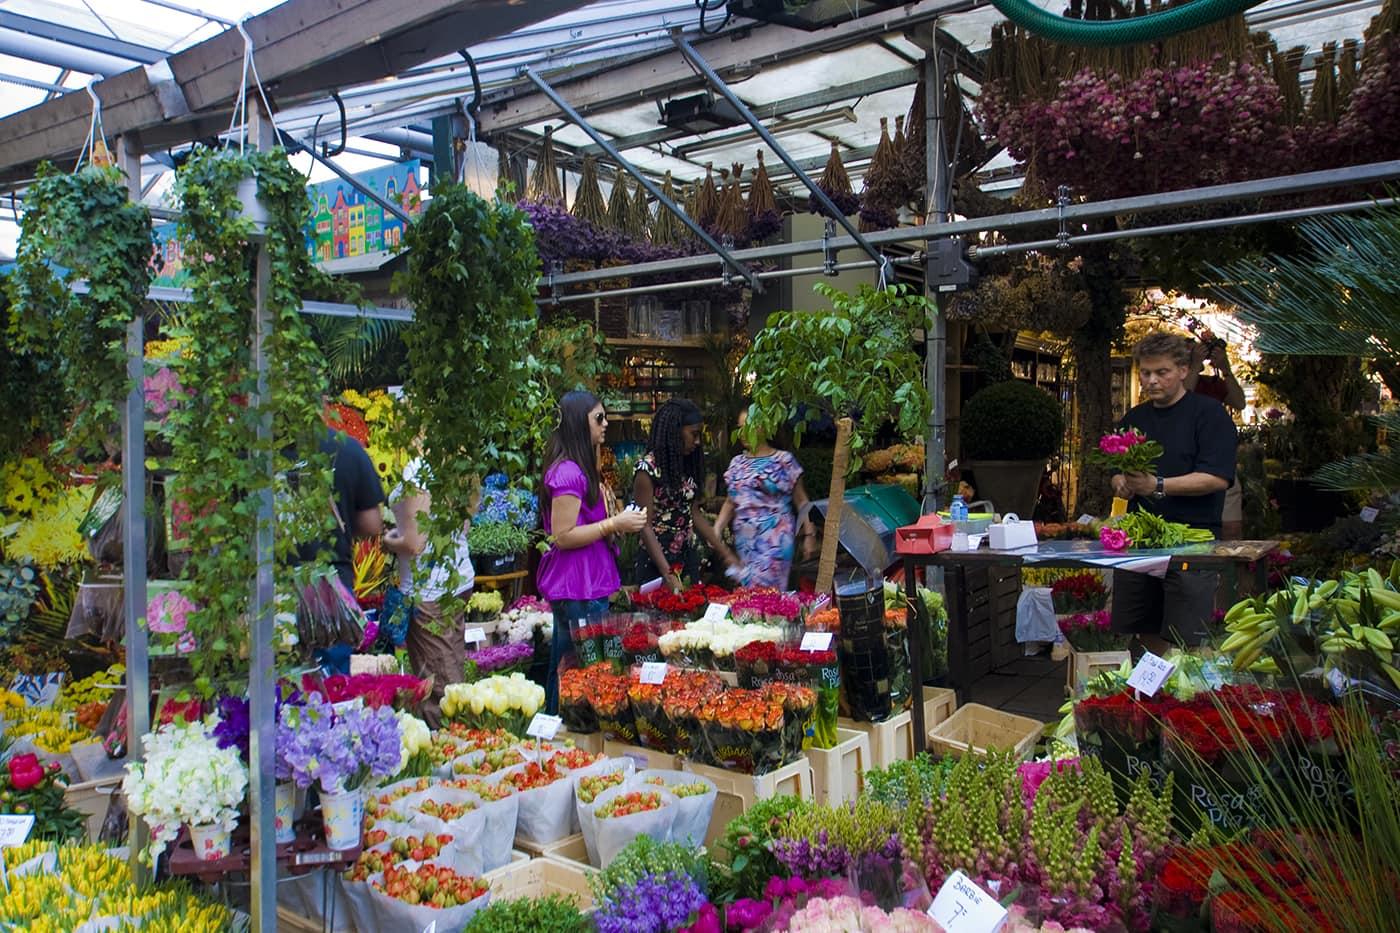 Bloemenmarkt flower market in Amsterdam.